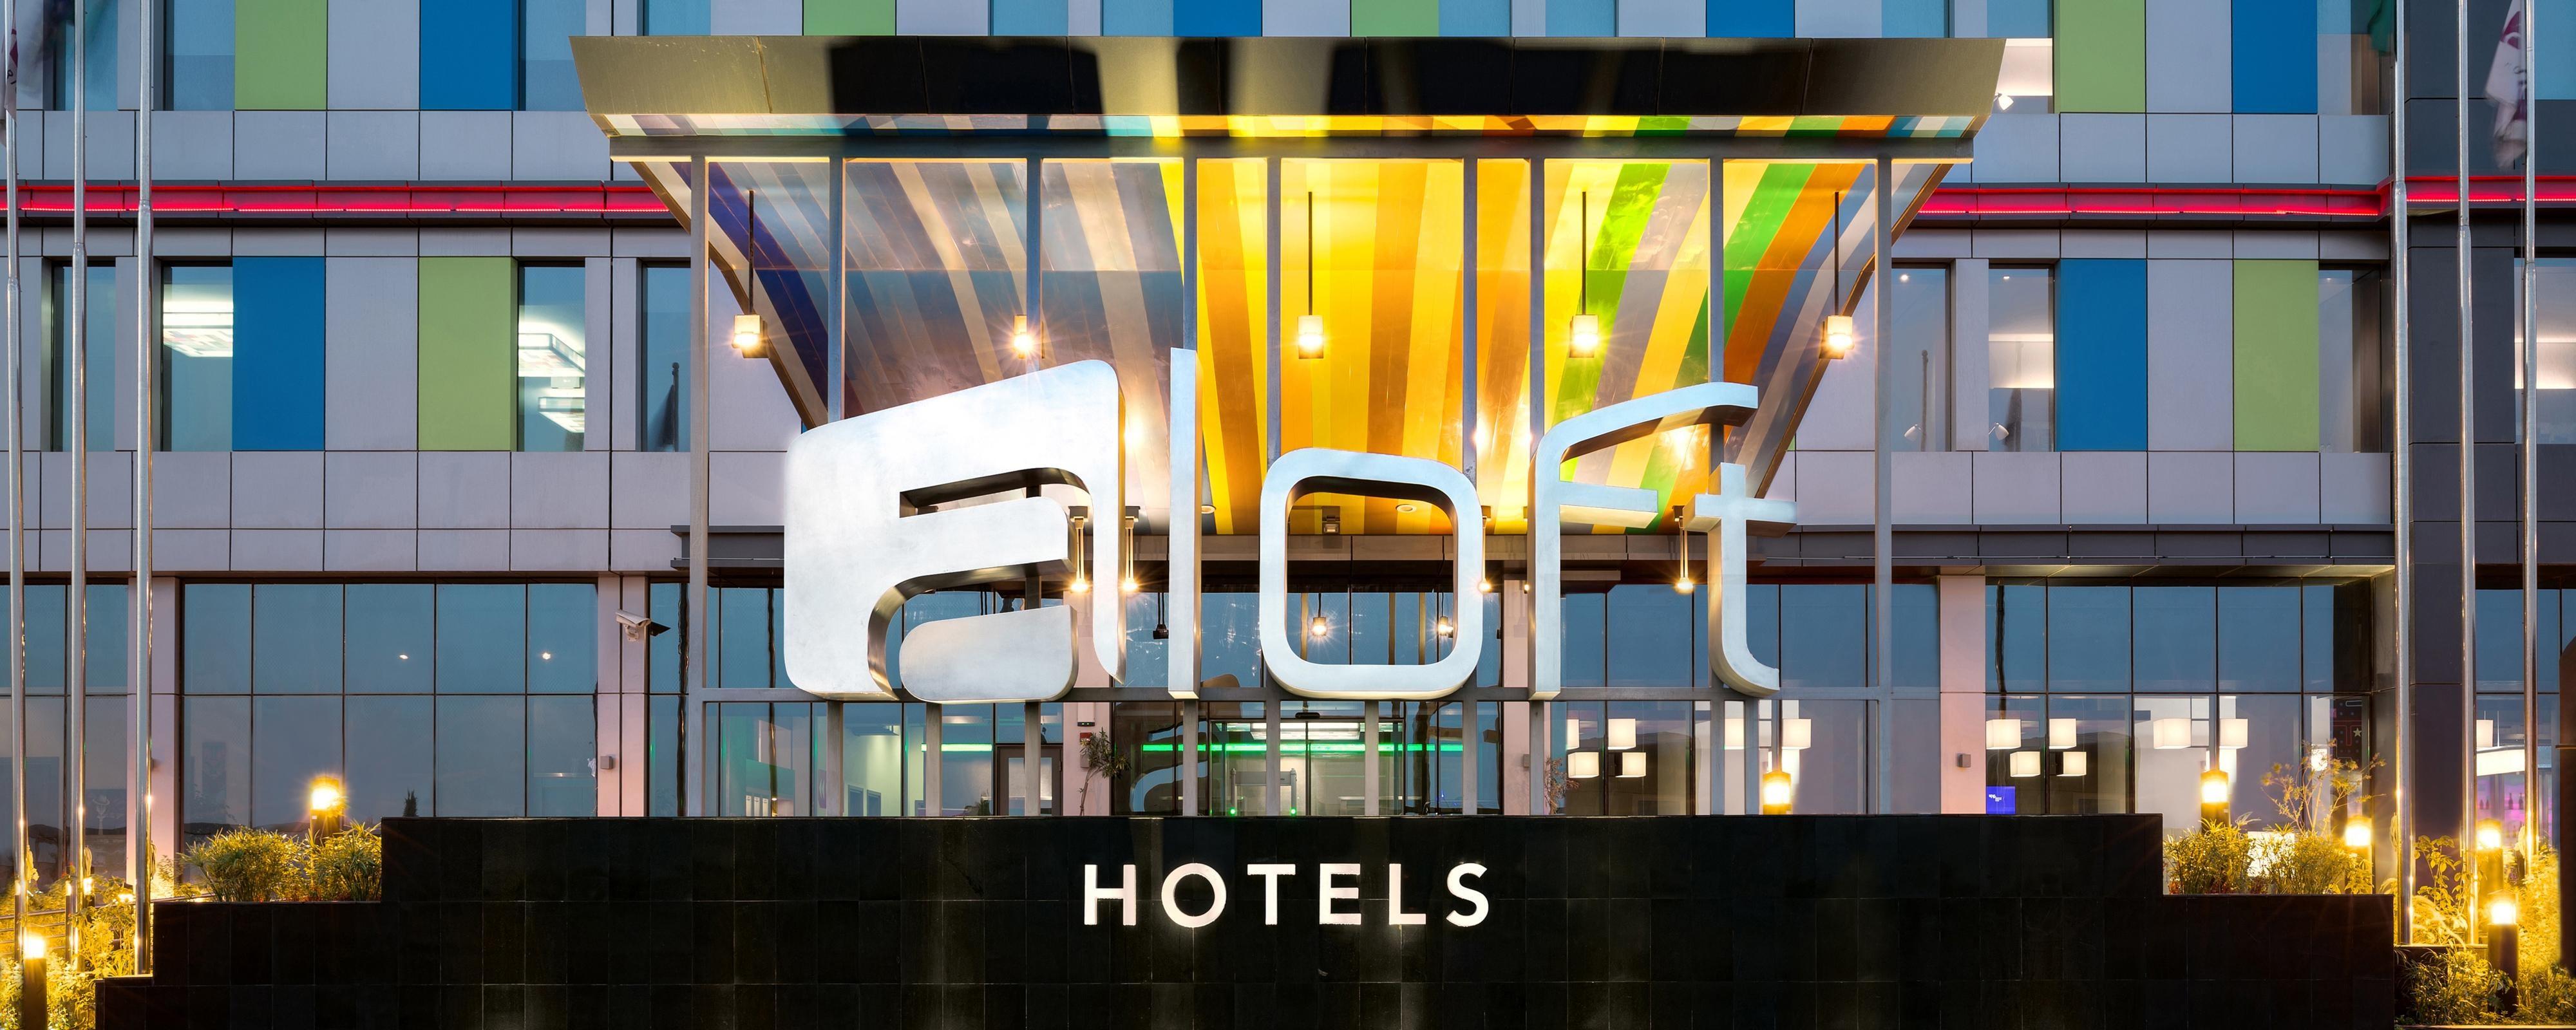 Aloft Hotel photography